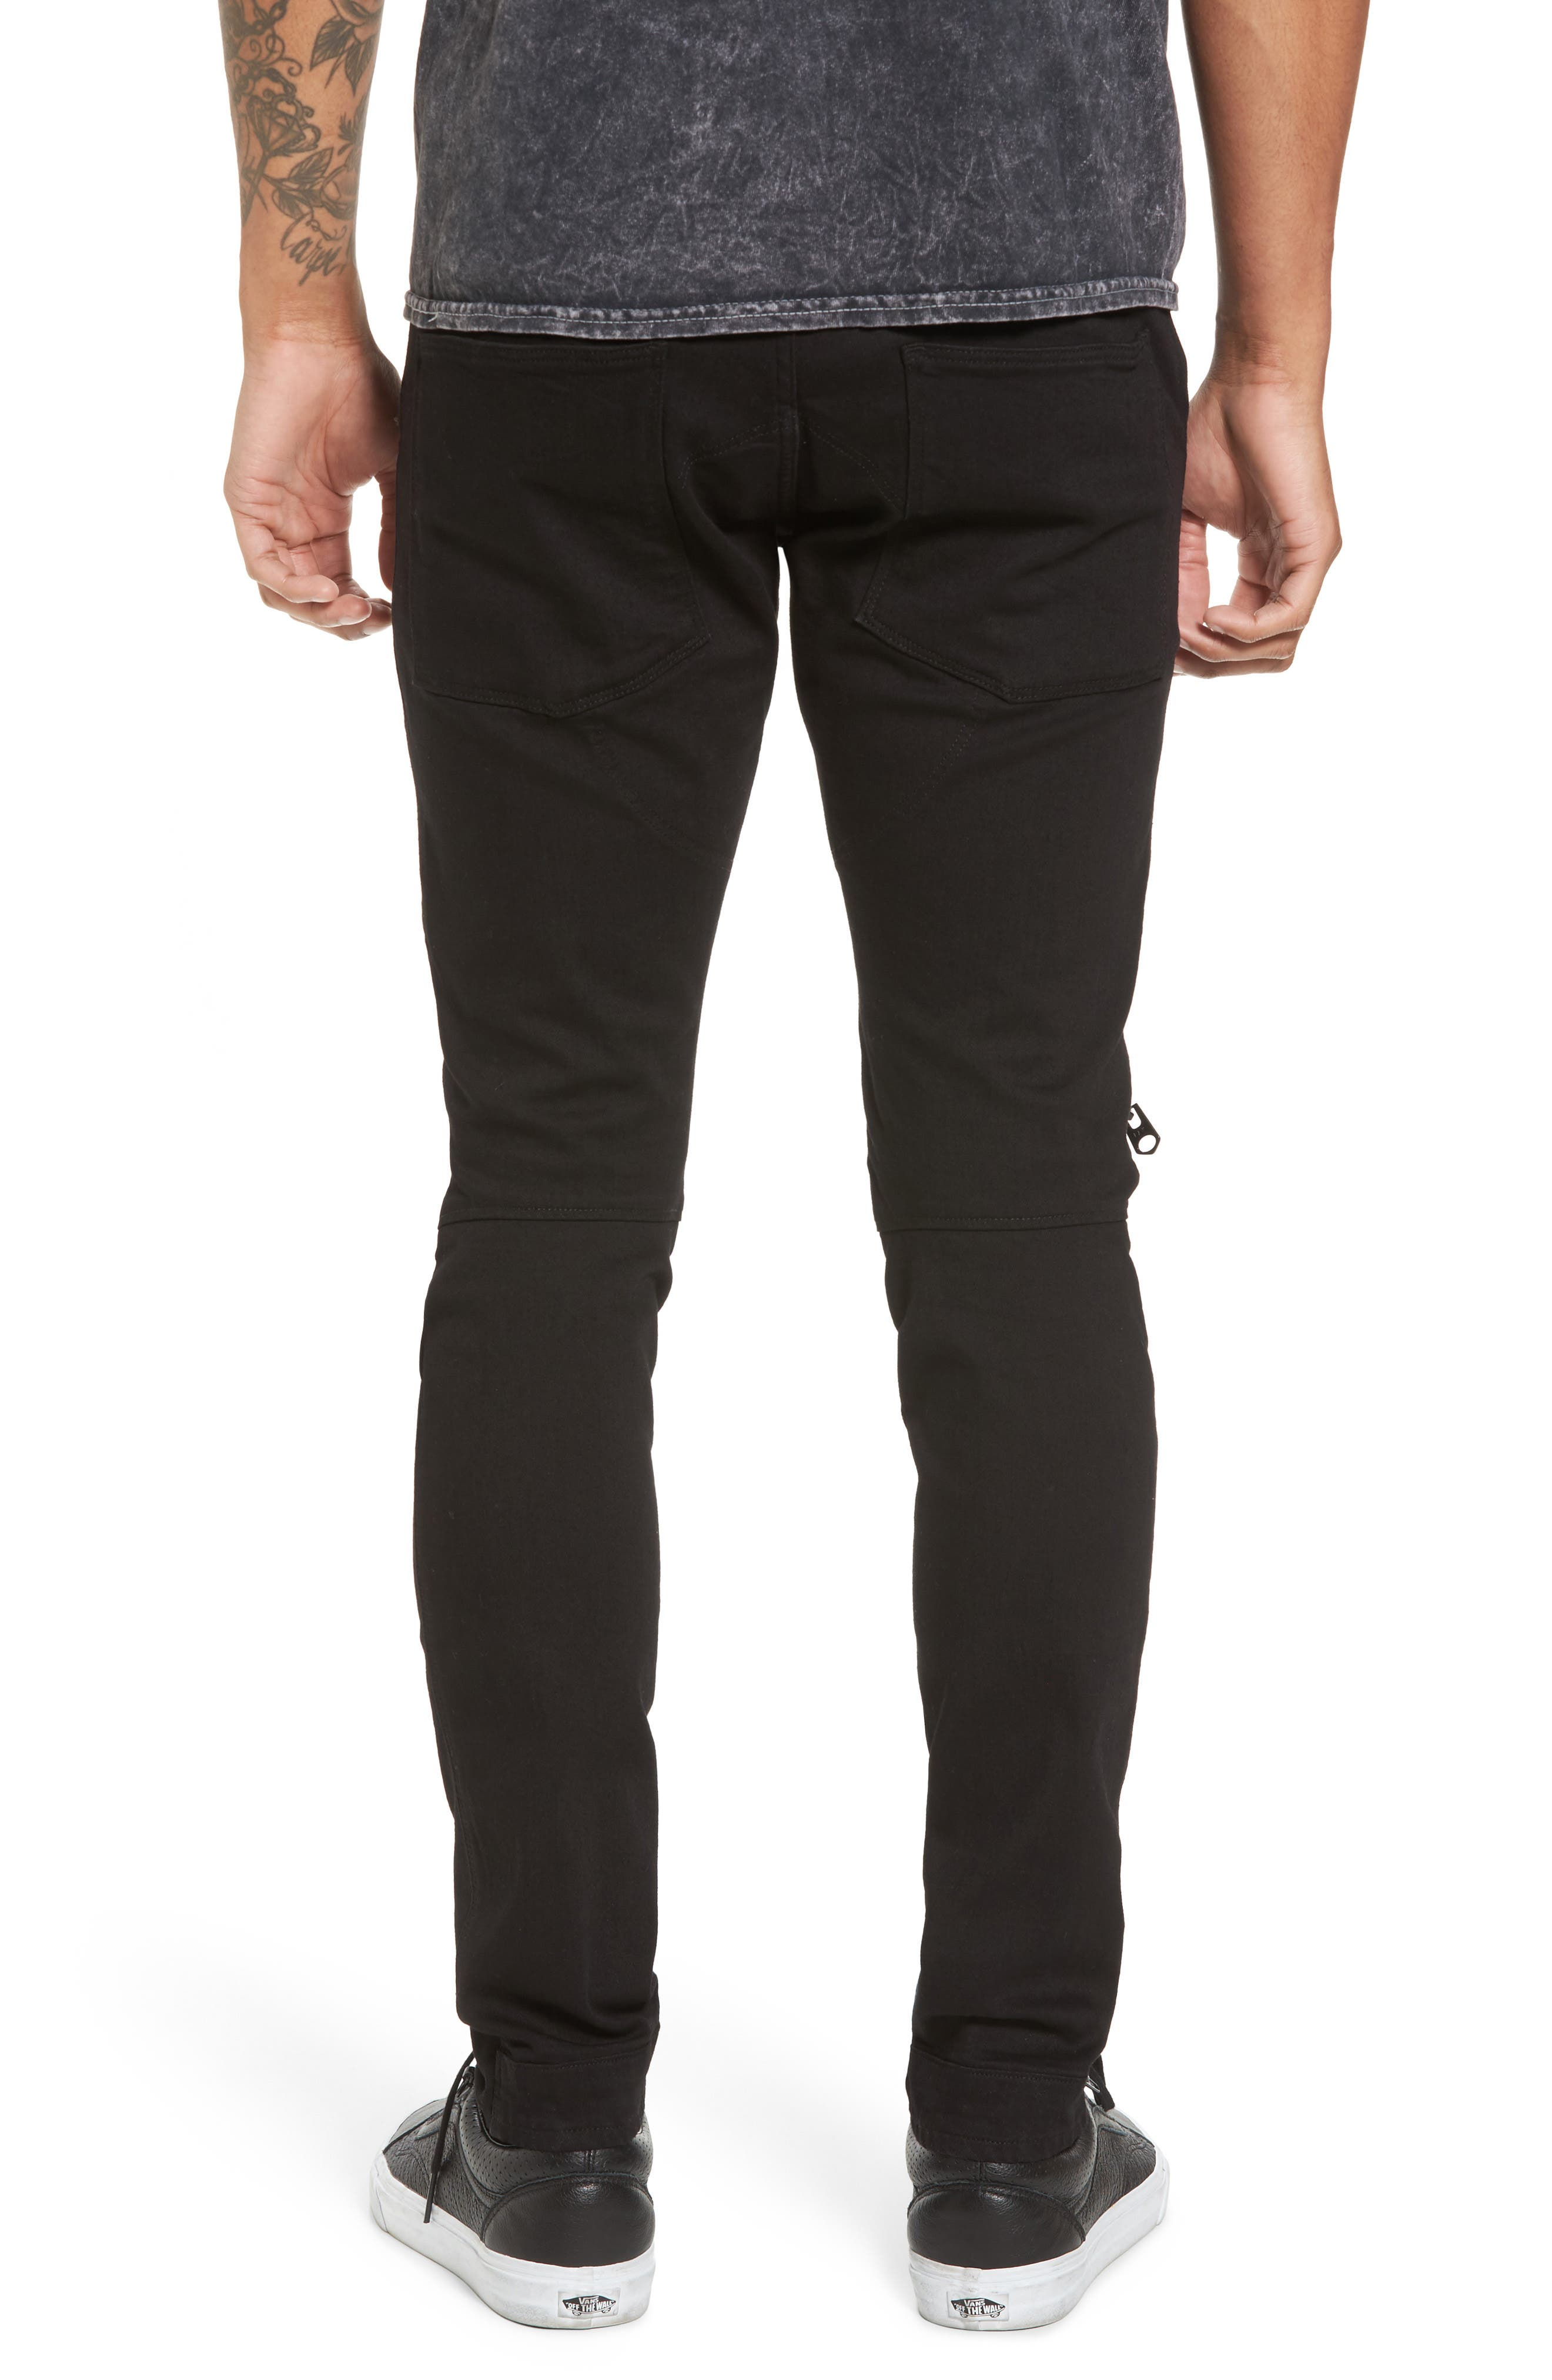 3D Zip Knee Super Slim Pants,                             Alternate thumbnail 2, color,                             Rinsed